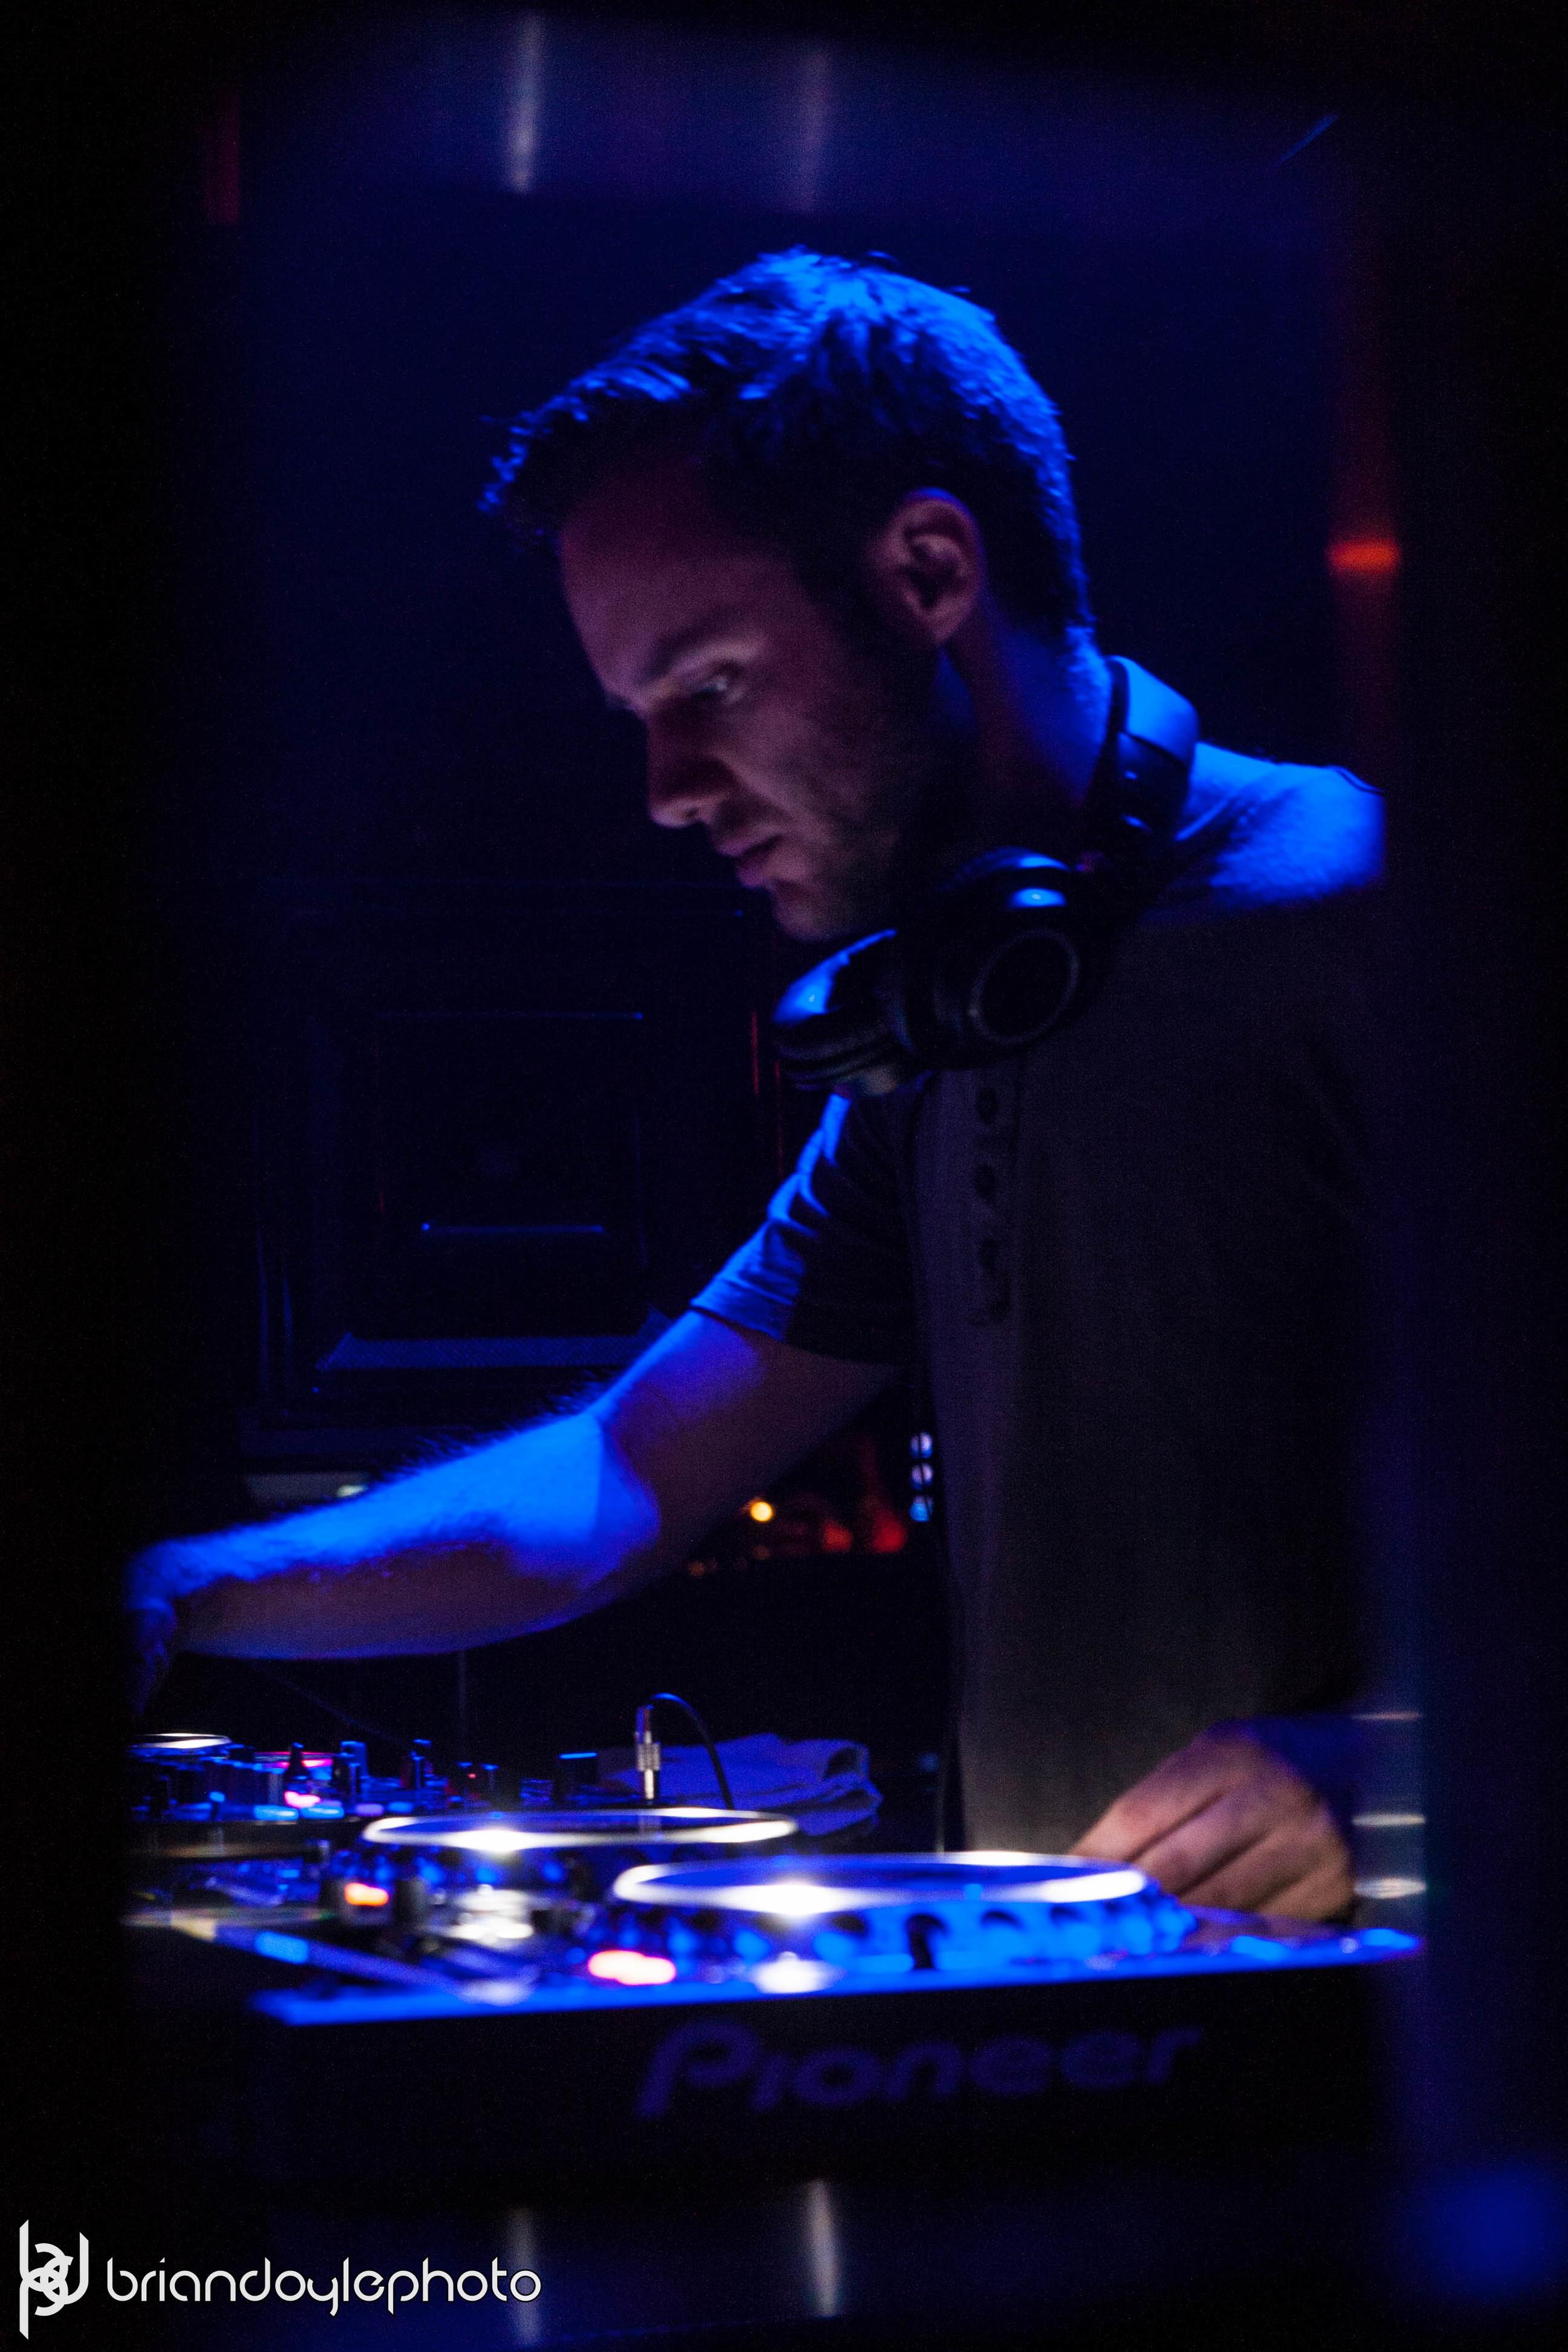 Bro Safari - Black Out Tour @ Avalon bdp 26.09.14-1.jpg